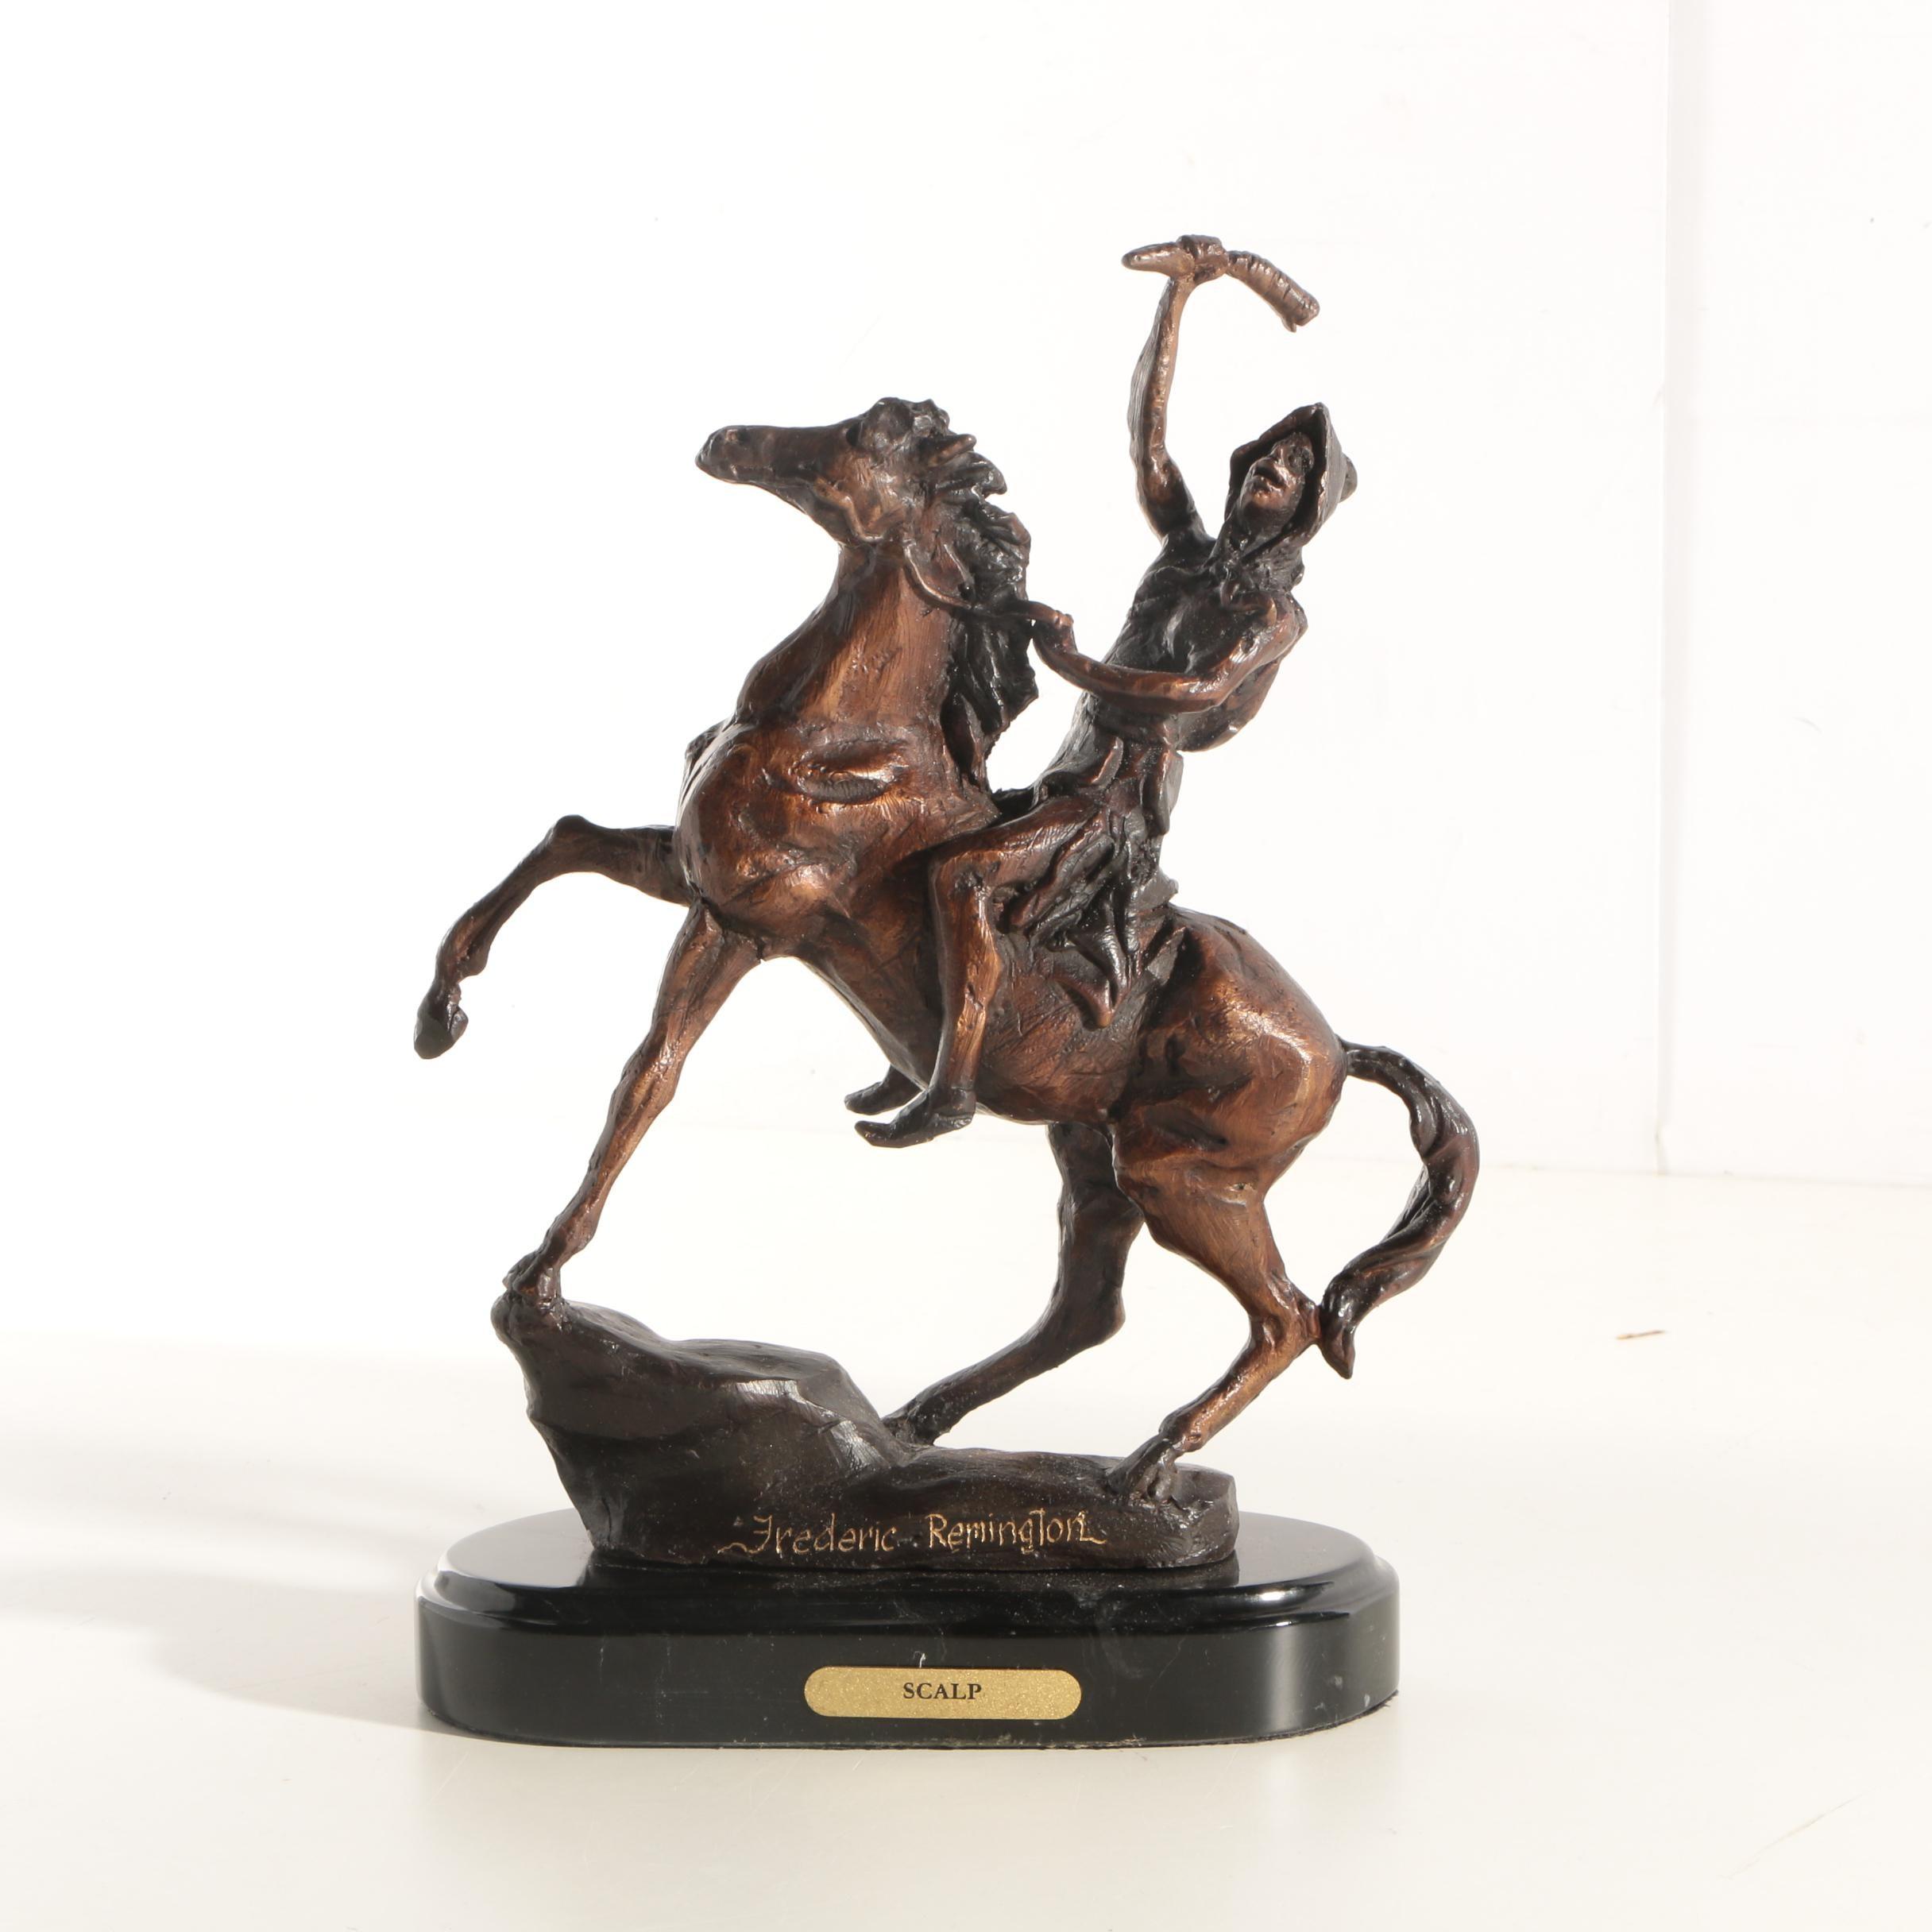 "Reproduction Metal Sculpture After Frederic Remington ""Scalp"""